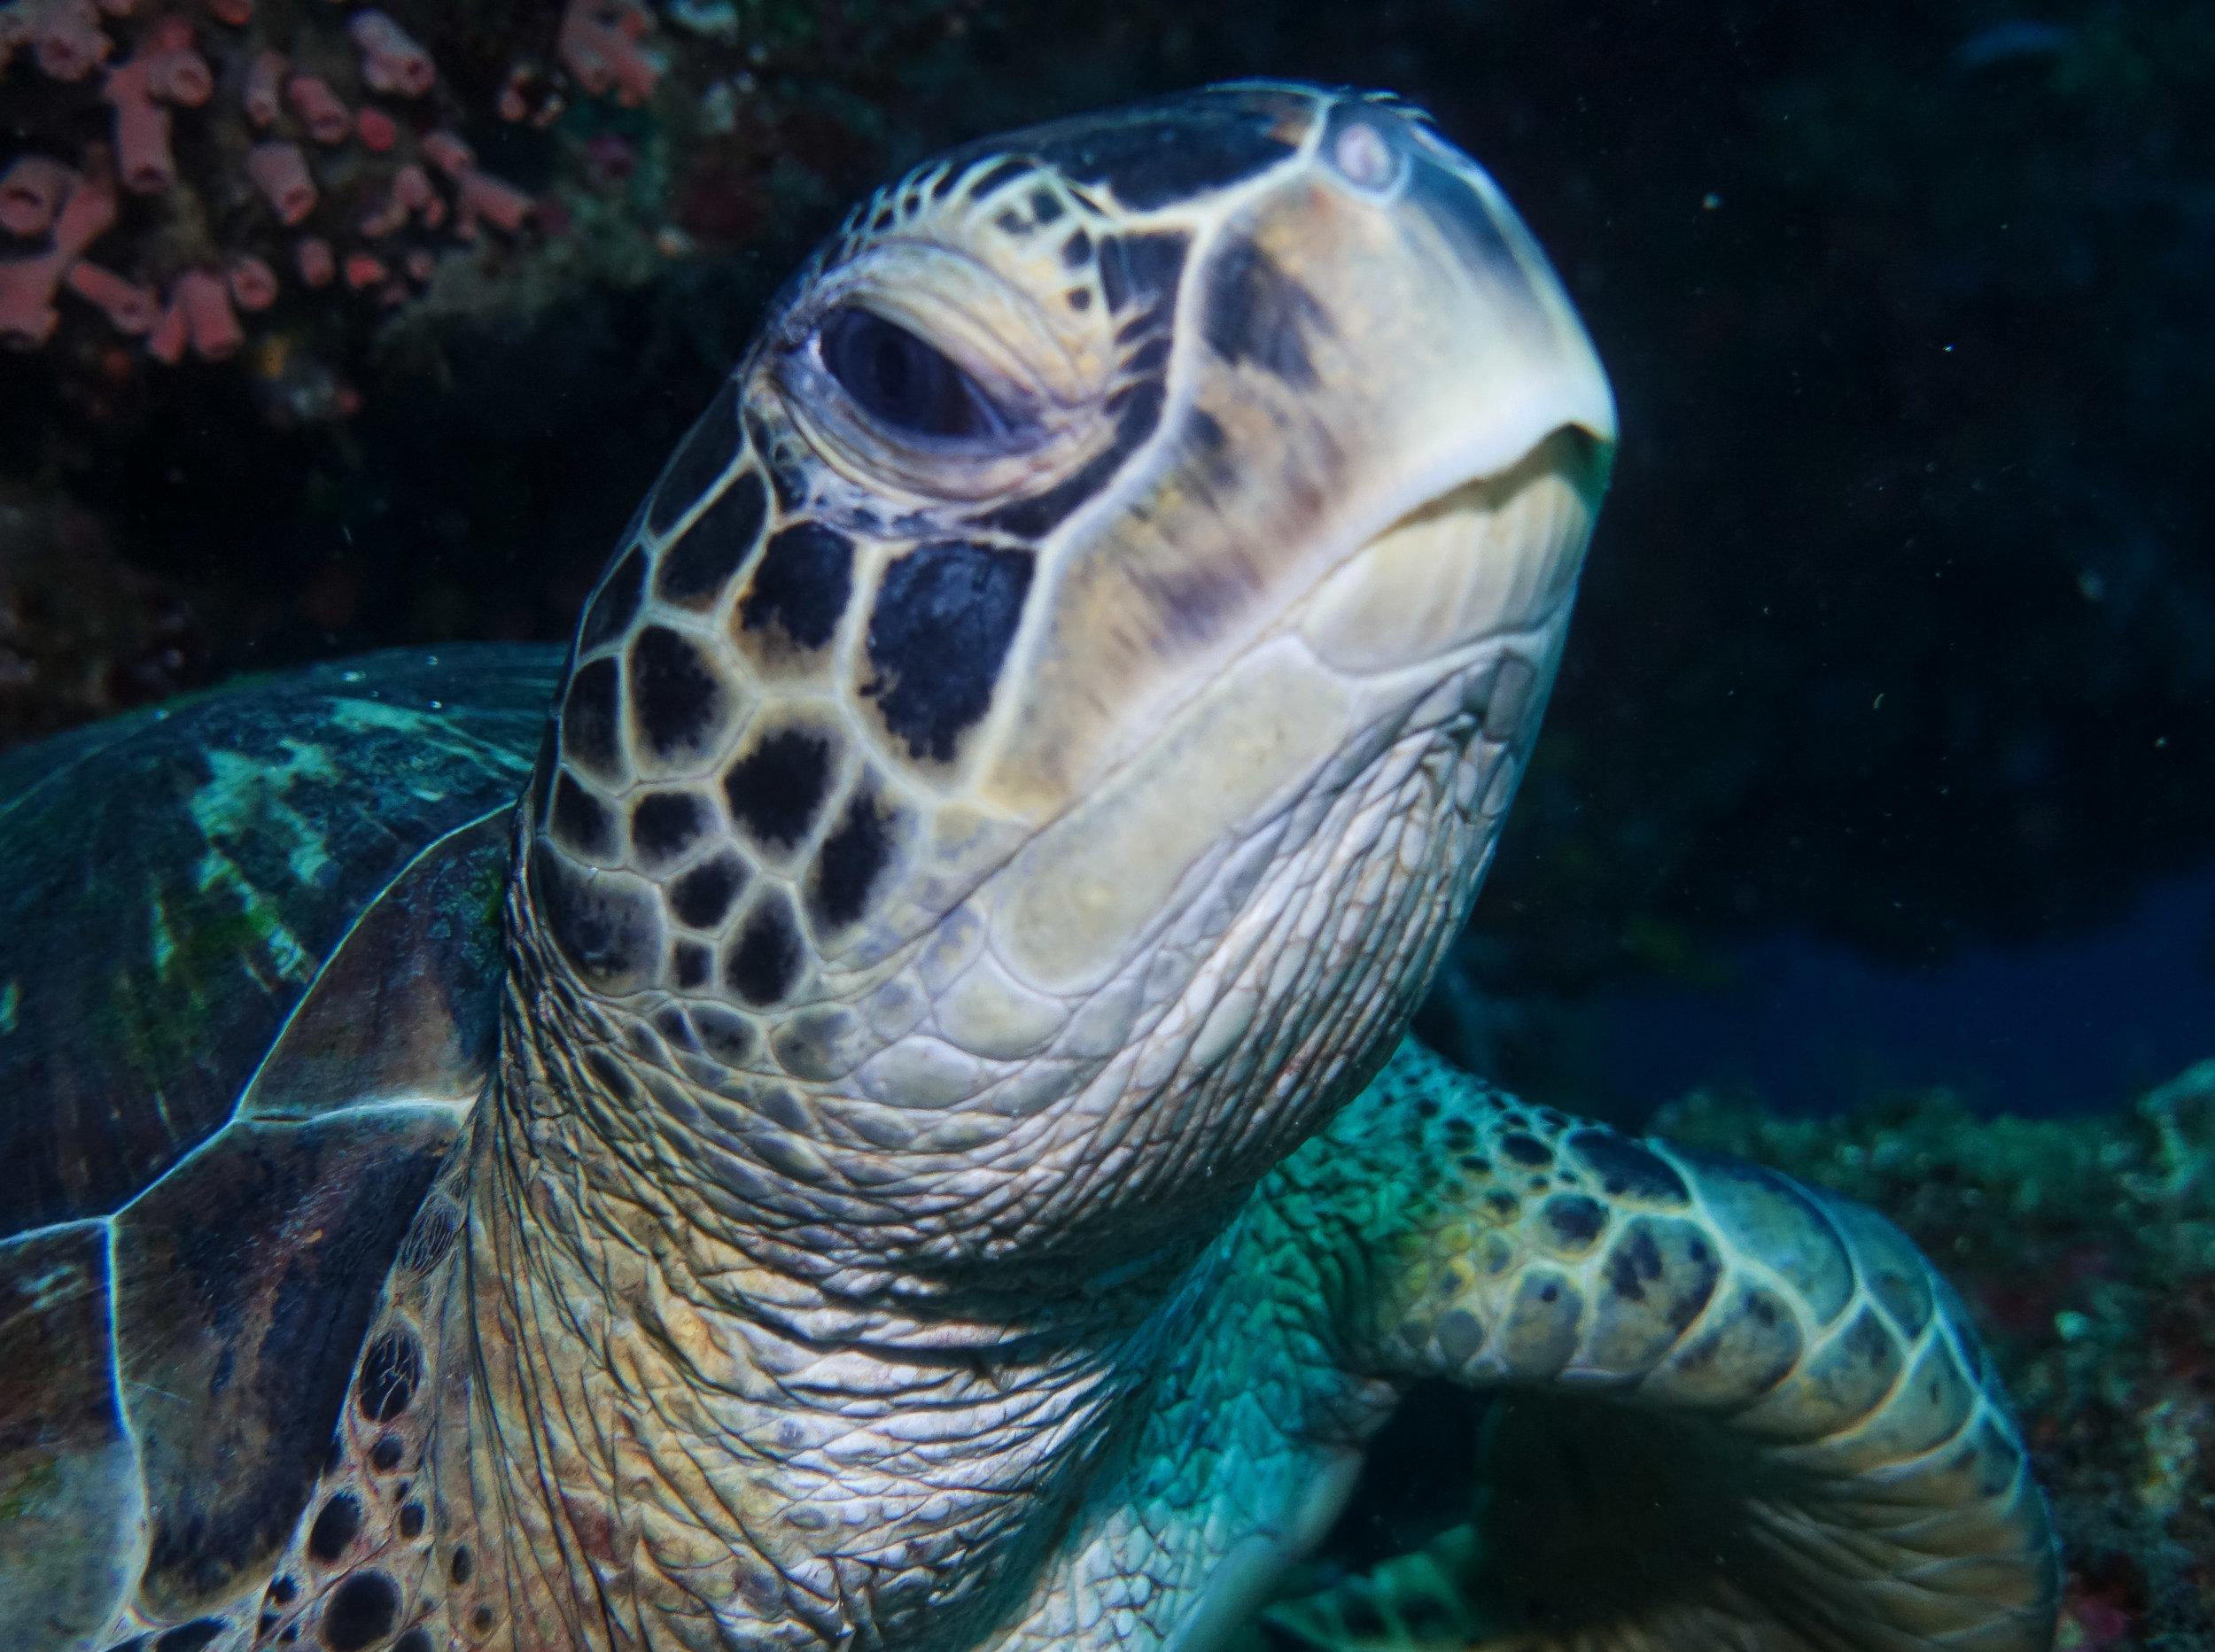 curio.trips.indonesia.diving.turtle.face.close.up.landscape.jpg